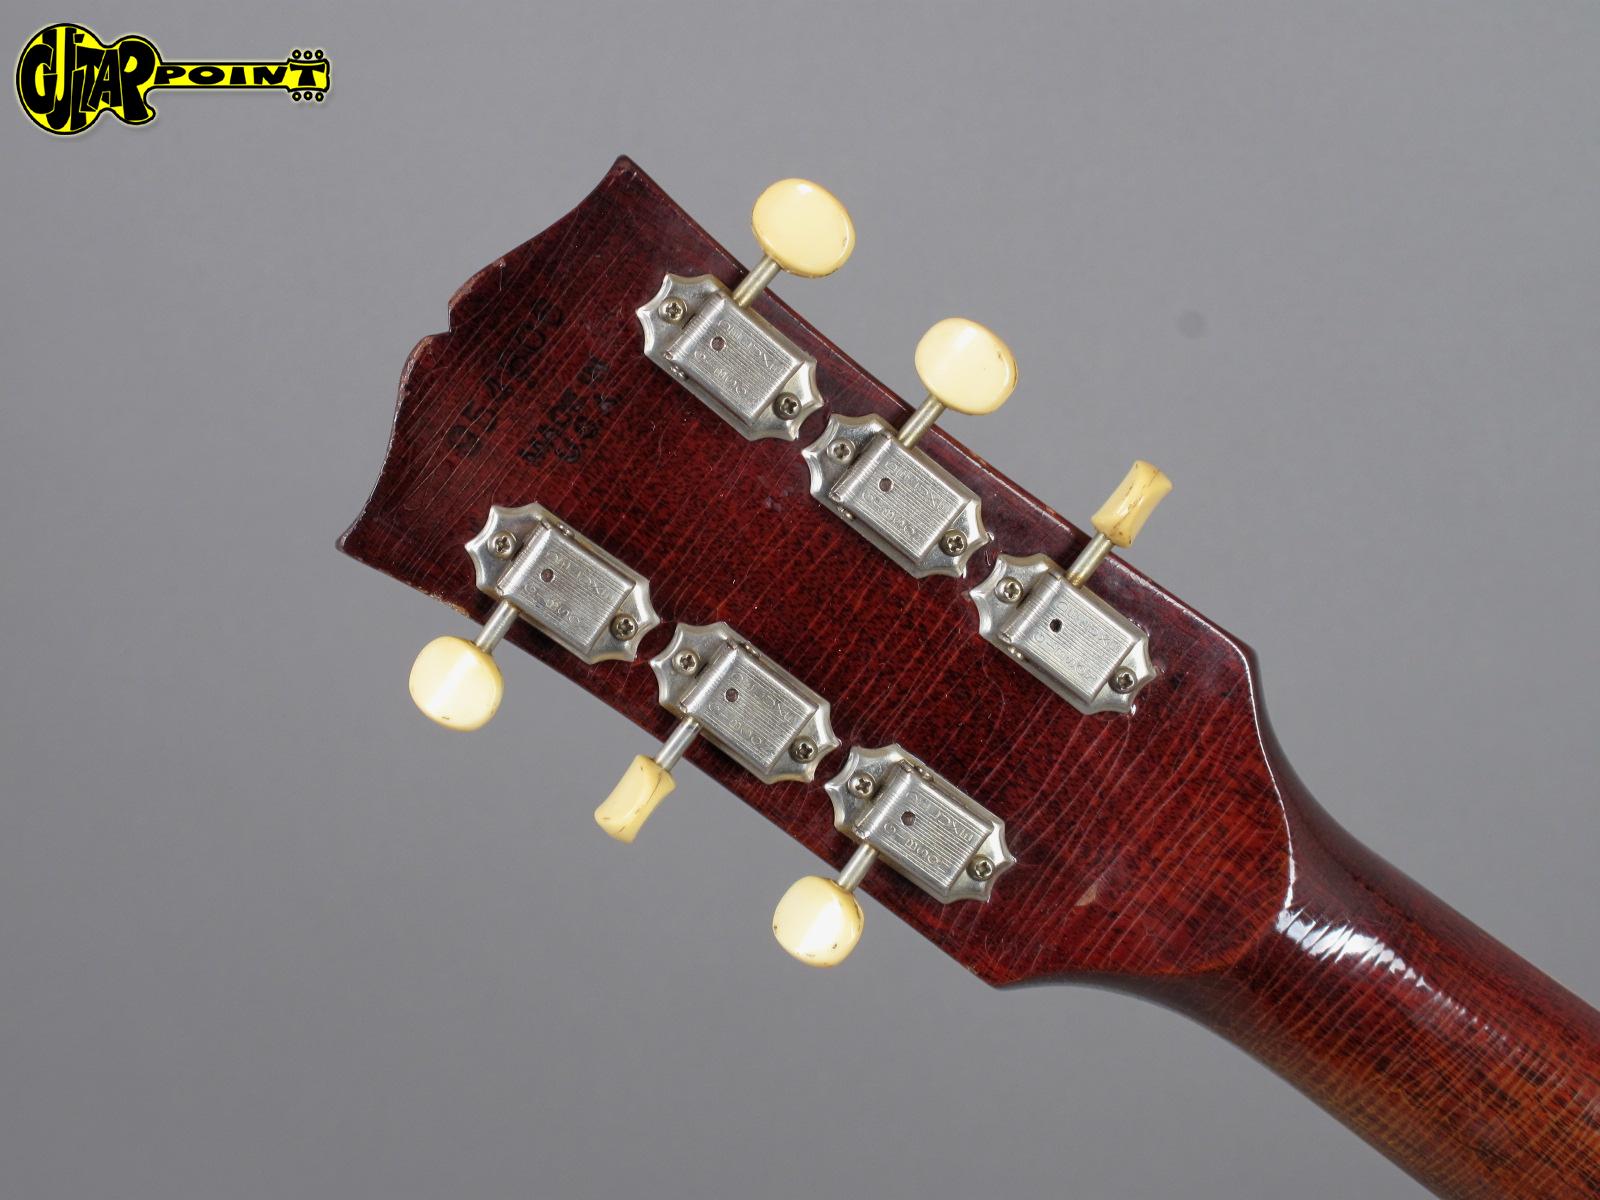 1970 Gibson ES-330 TD - Cherry (long neck)